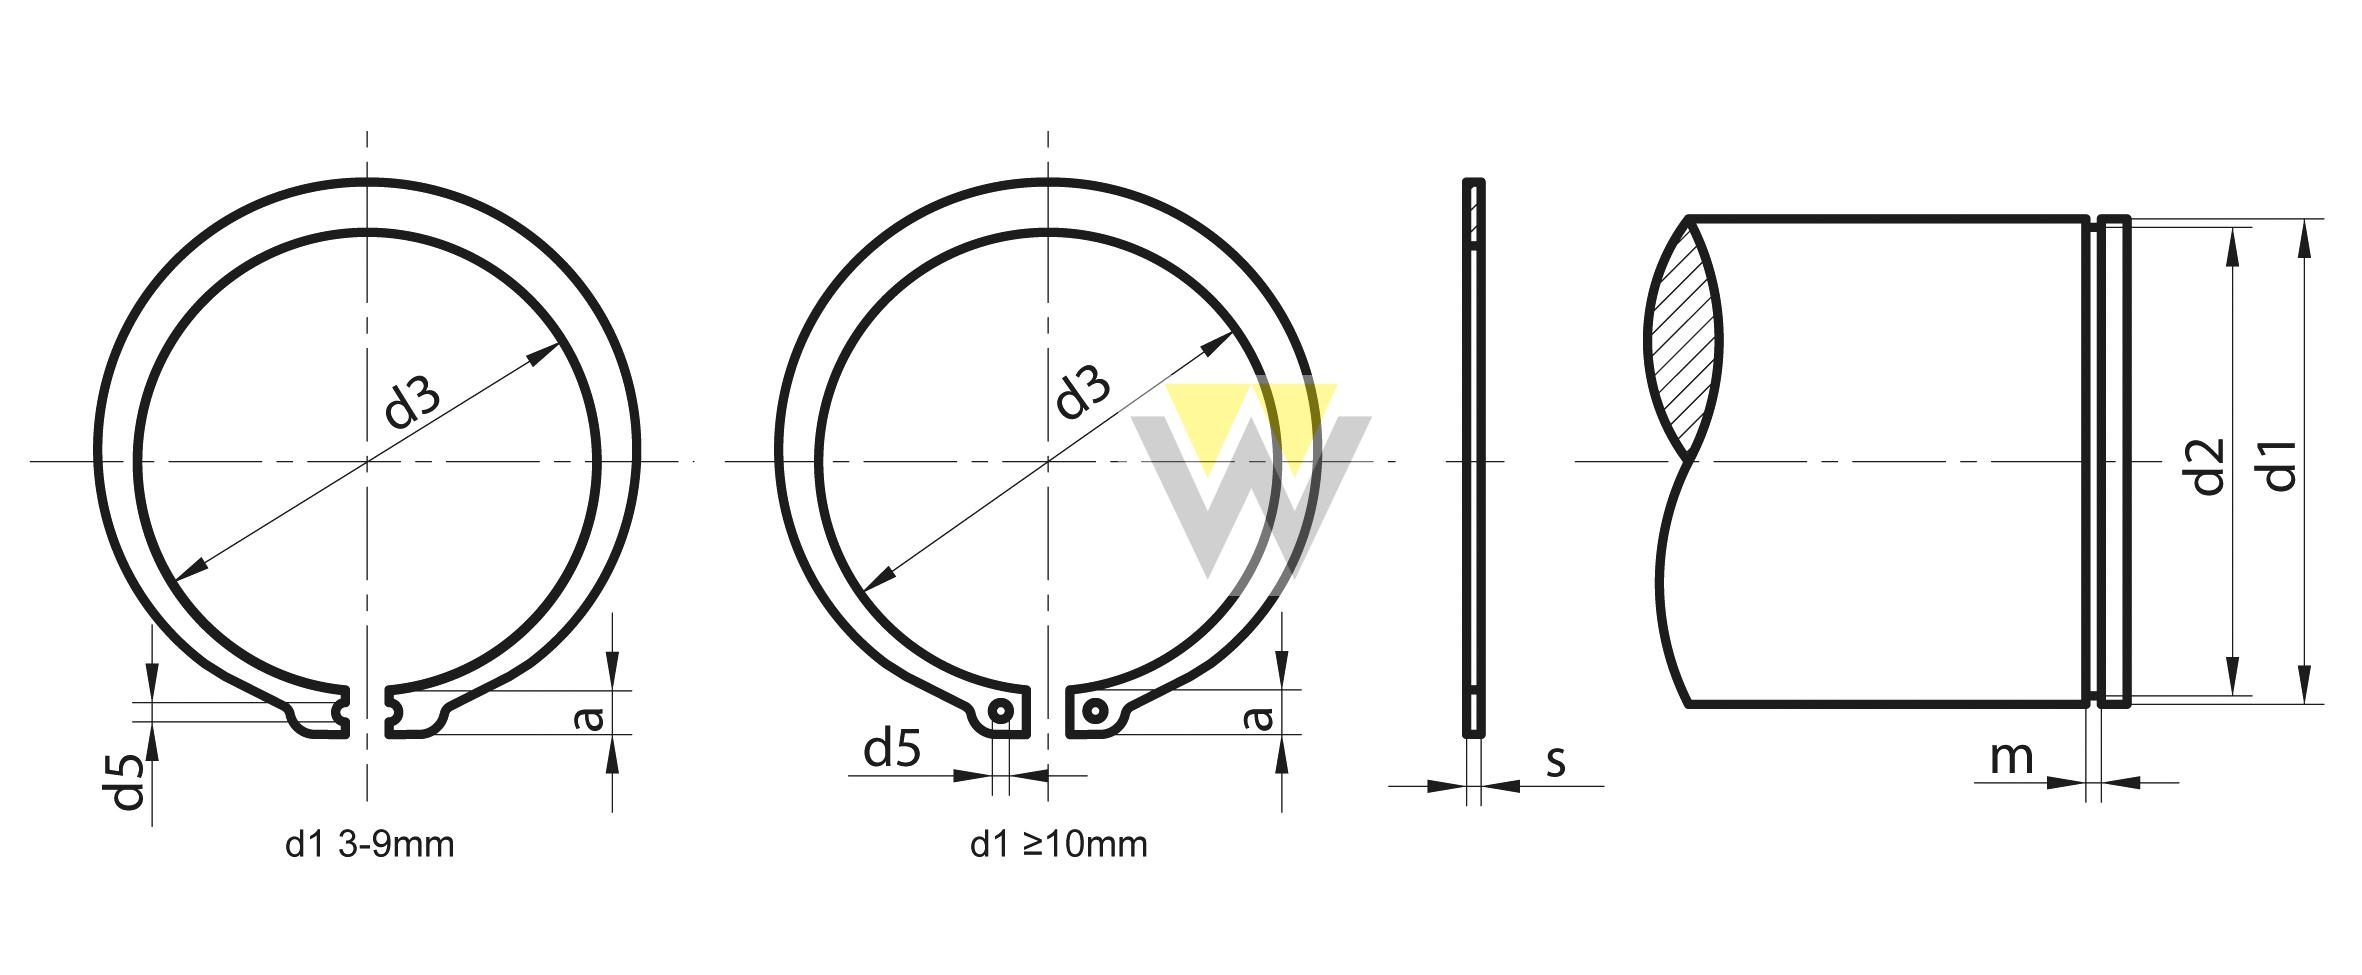 WERCHEM_DIN471_drawing